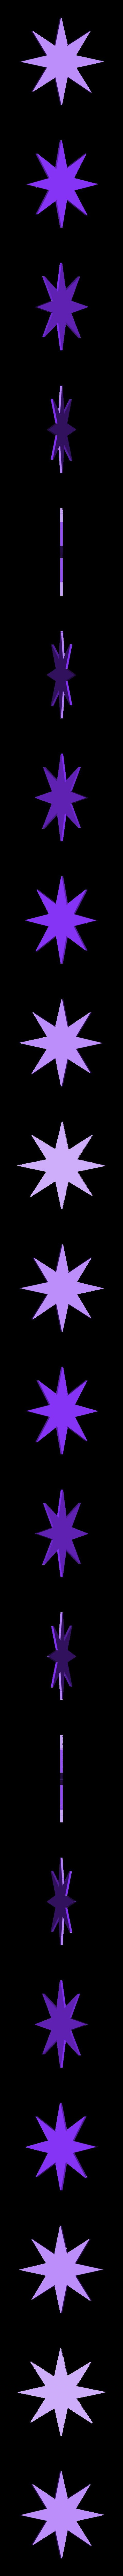 étoile8 3.stl Download STL file the christmas star • 3D printer model, catf3d